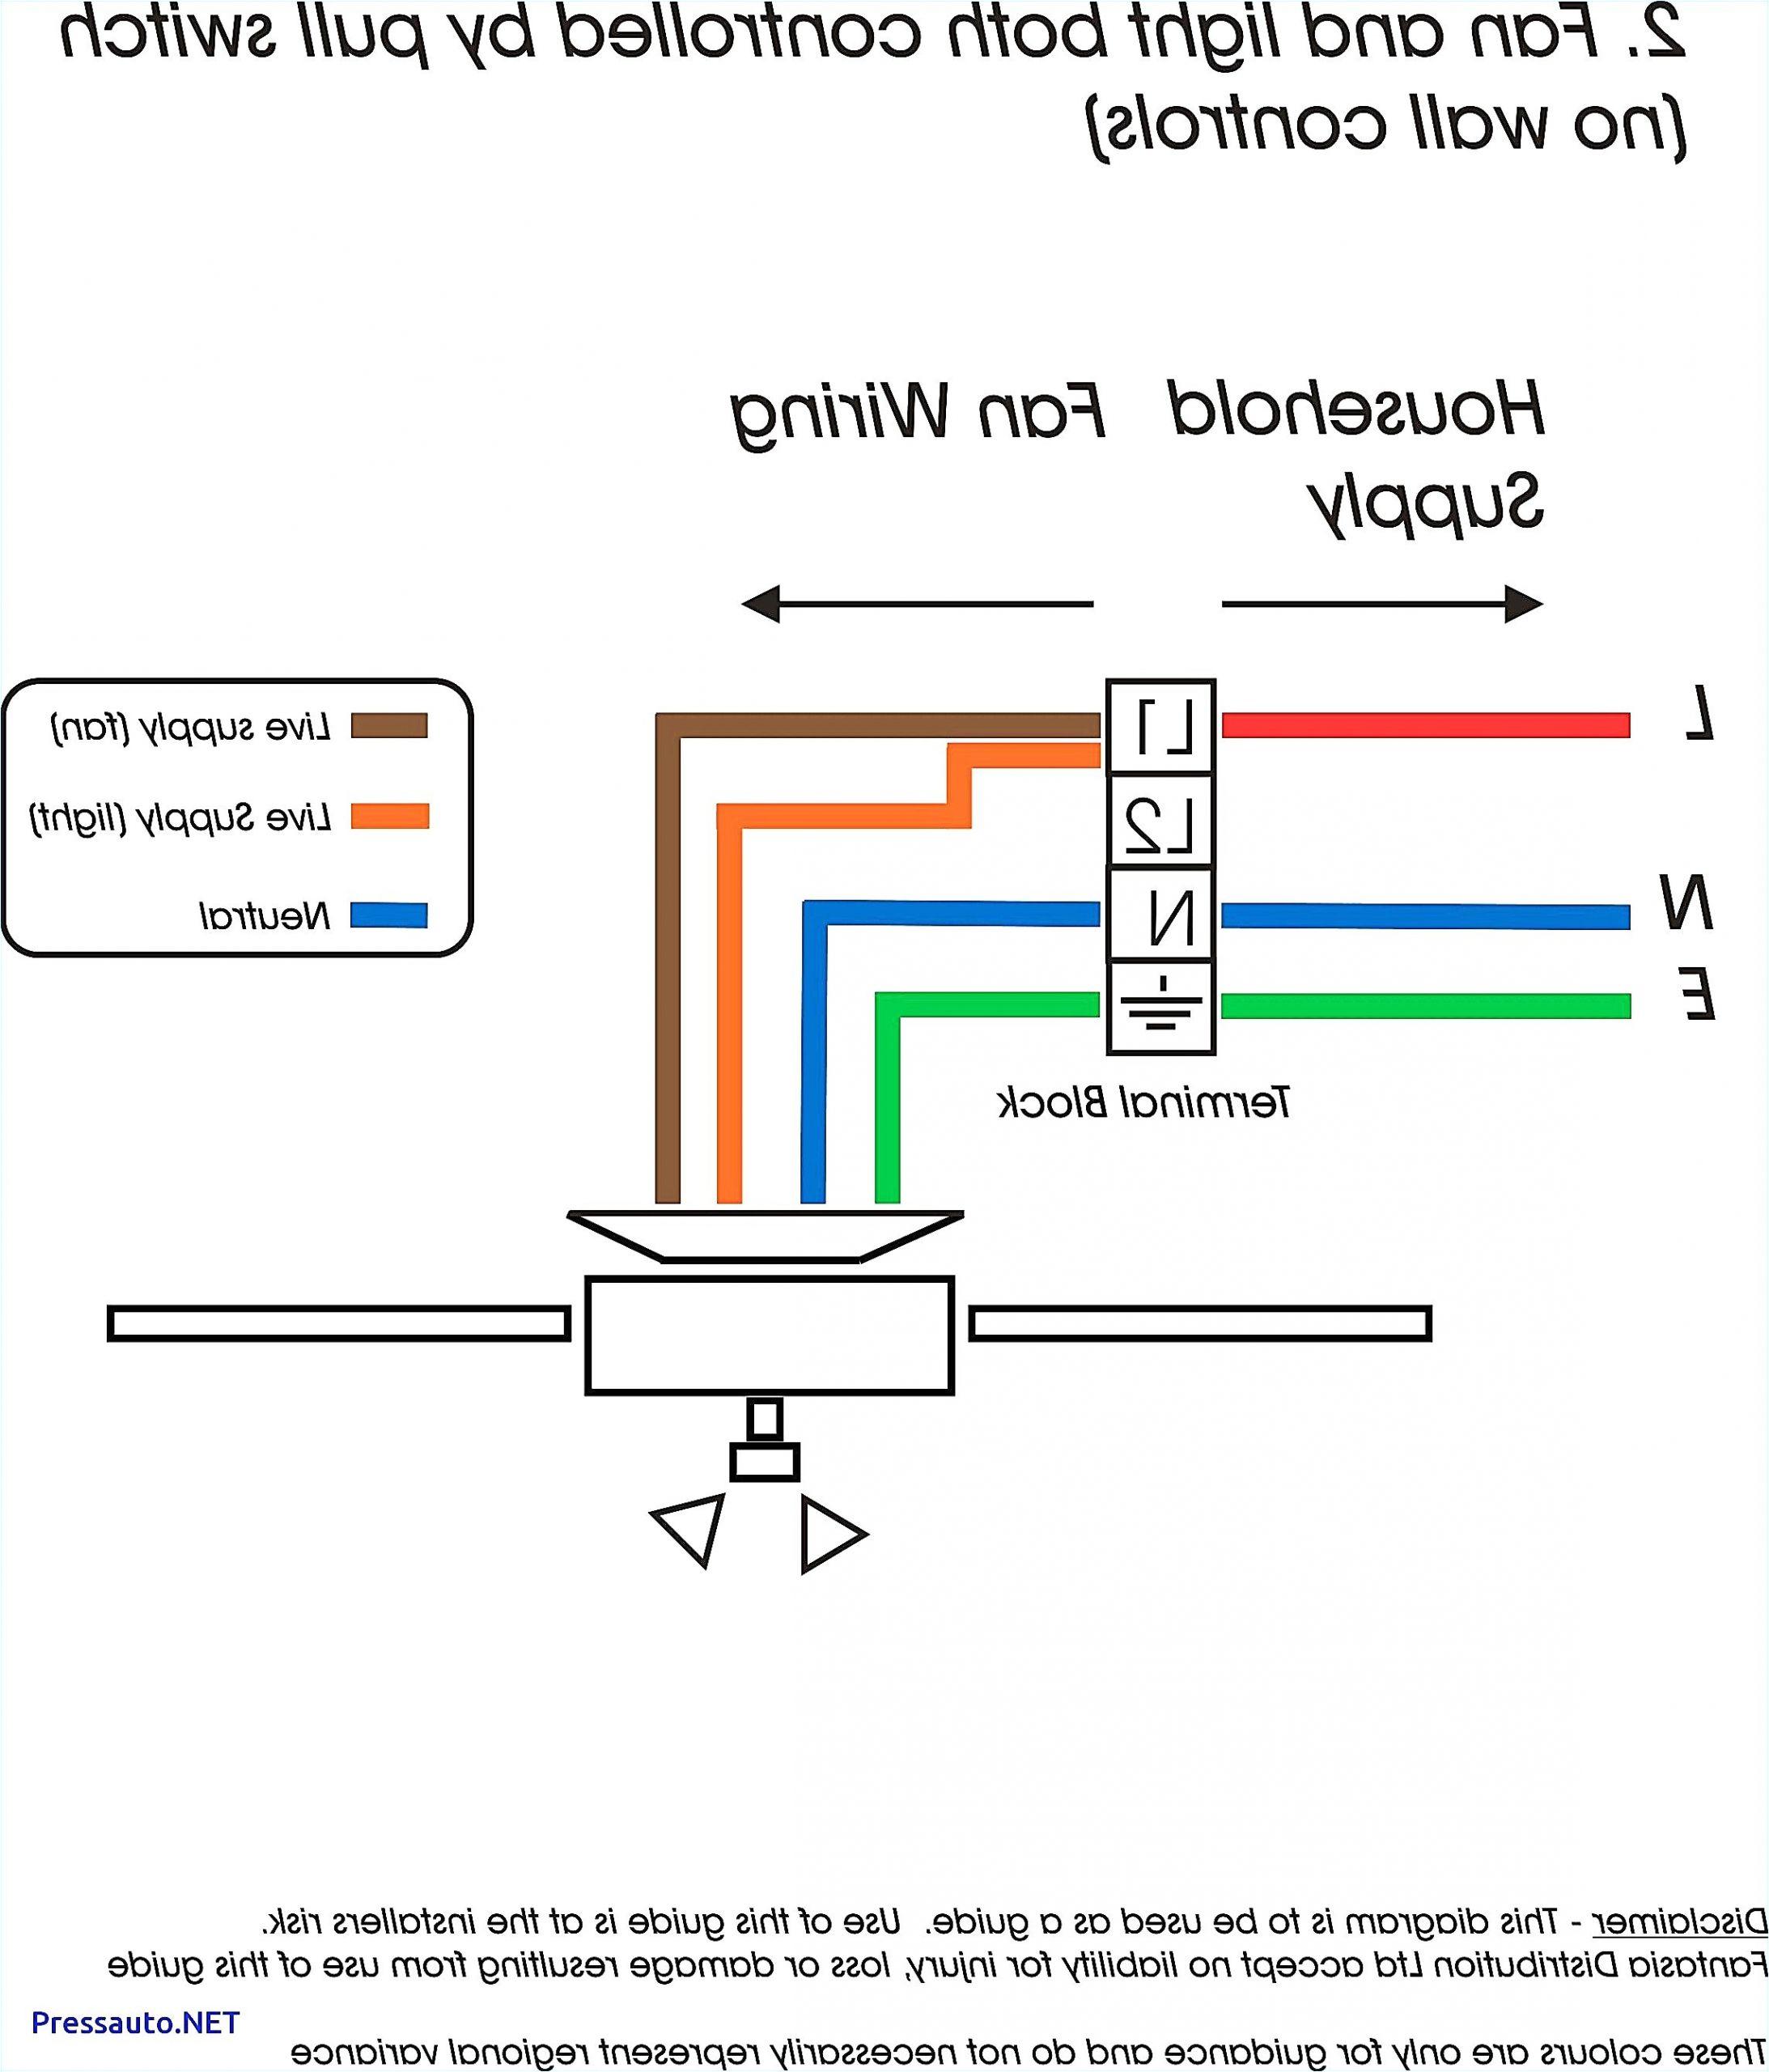 2003 hyundai tiburon radio wiring diagram free downloads 2006 sonata jpg